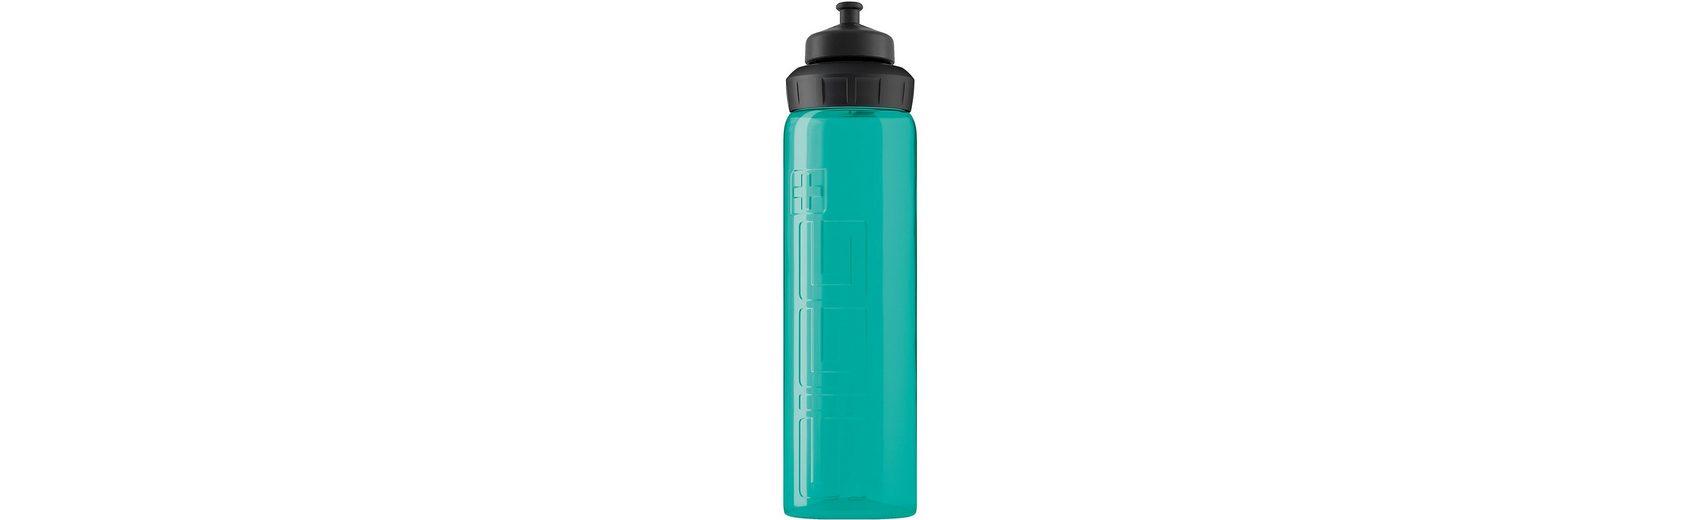 SIGG Trinkflasche VIVA 3-Stage Aqua transparent, 750 ml